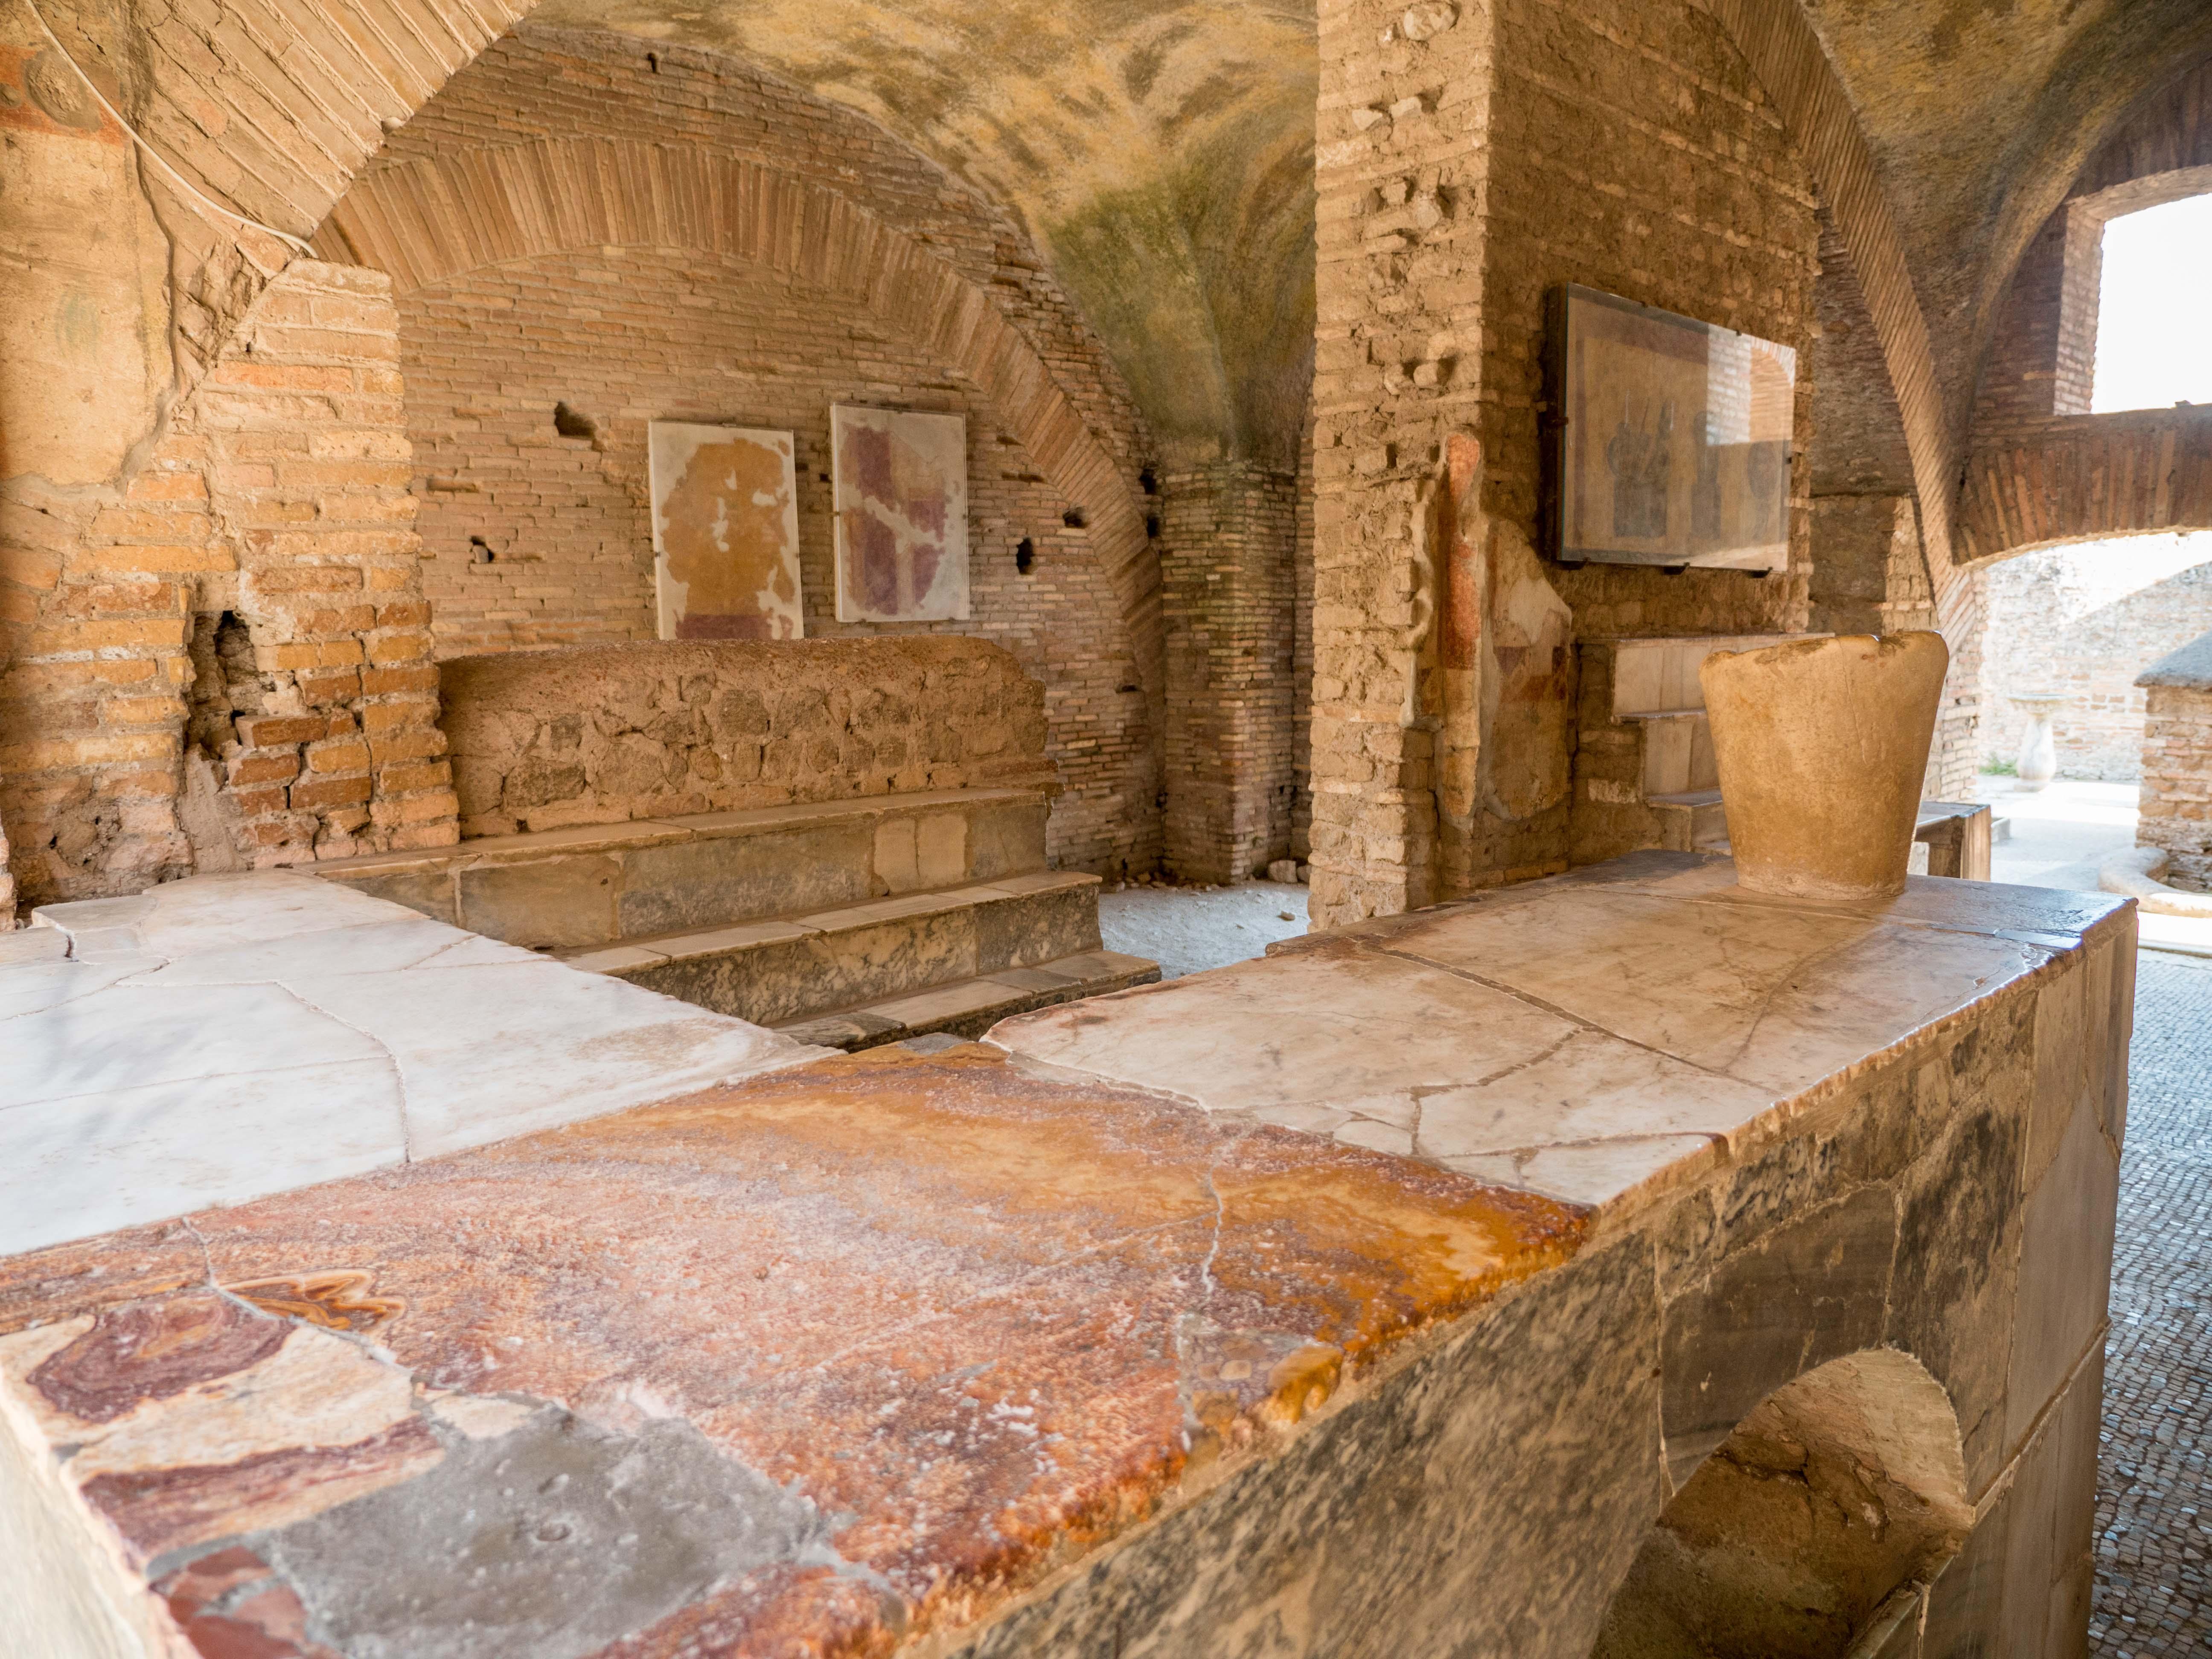 Shop Near the Forum Baths